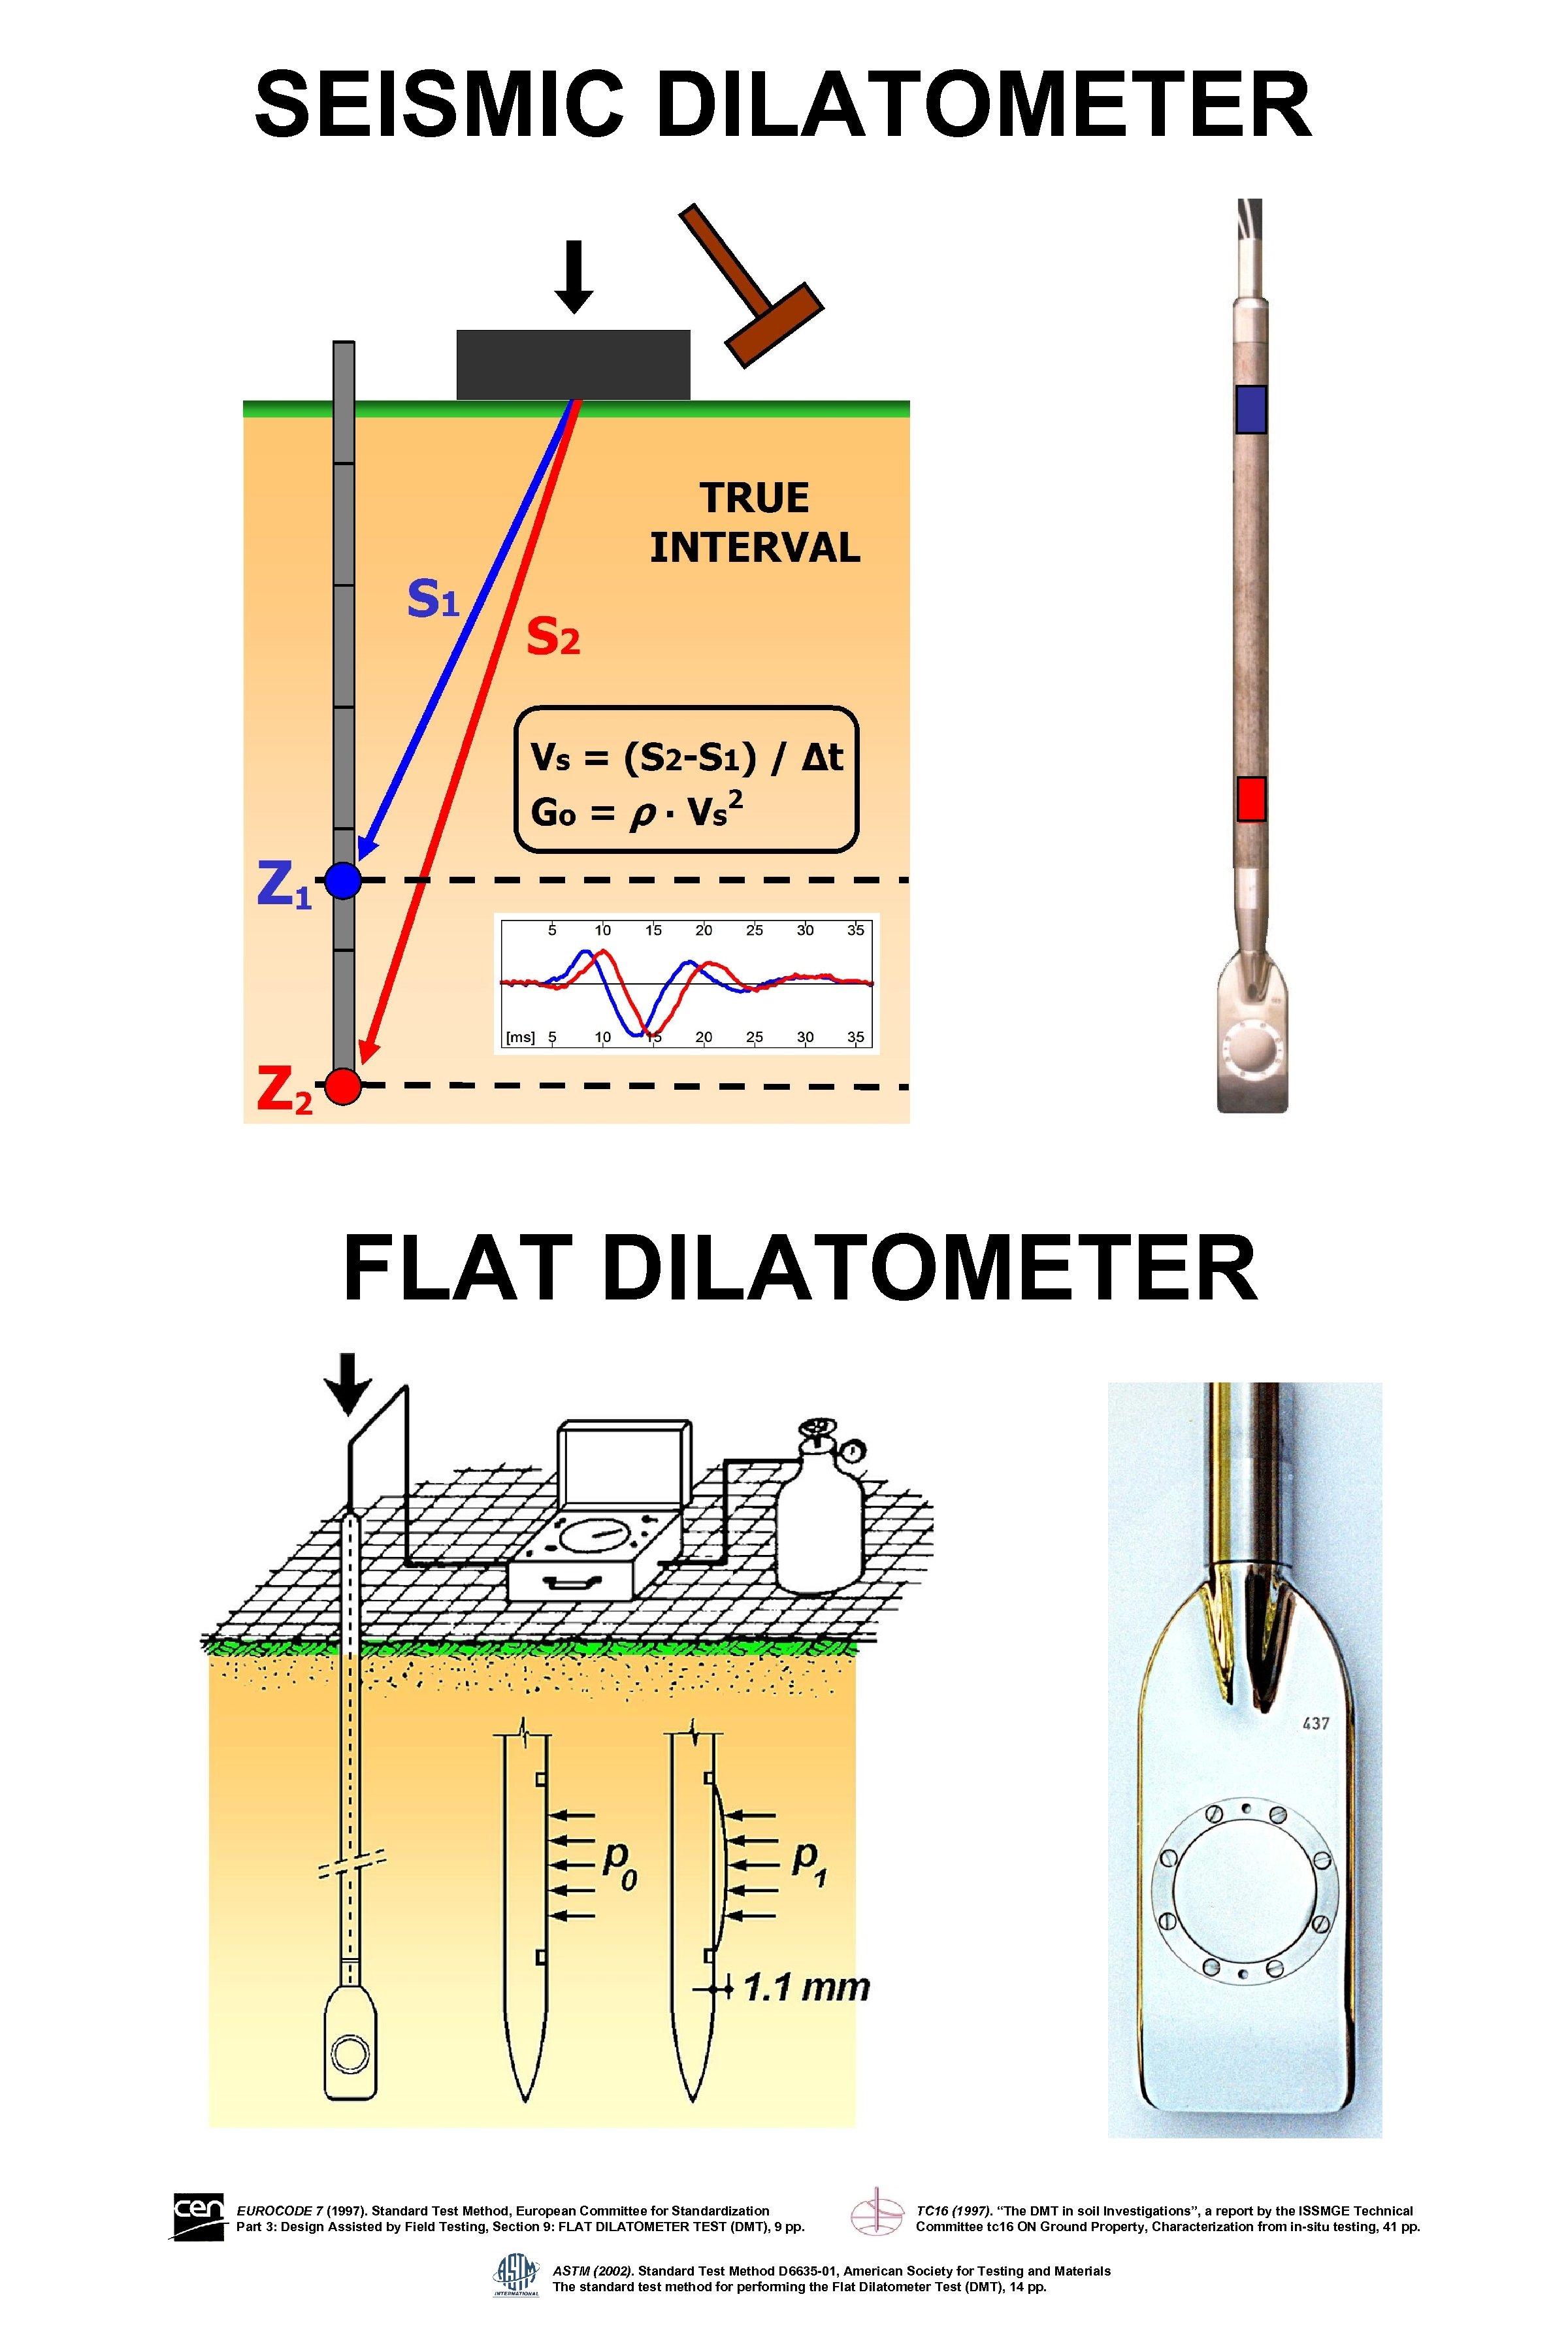 SEISMIC DILATOMETER FLAT DILATOMETER EUROCODE 7 (1997). Standard Test Method, European Committee for Standardization